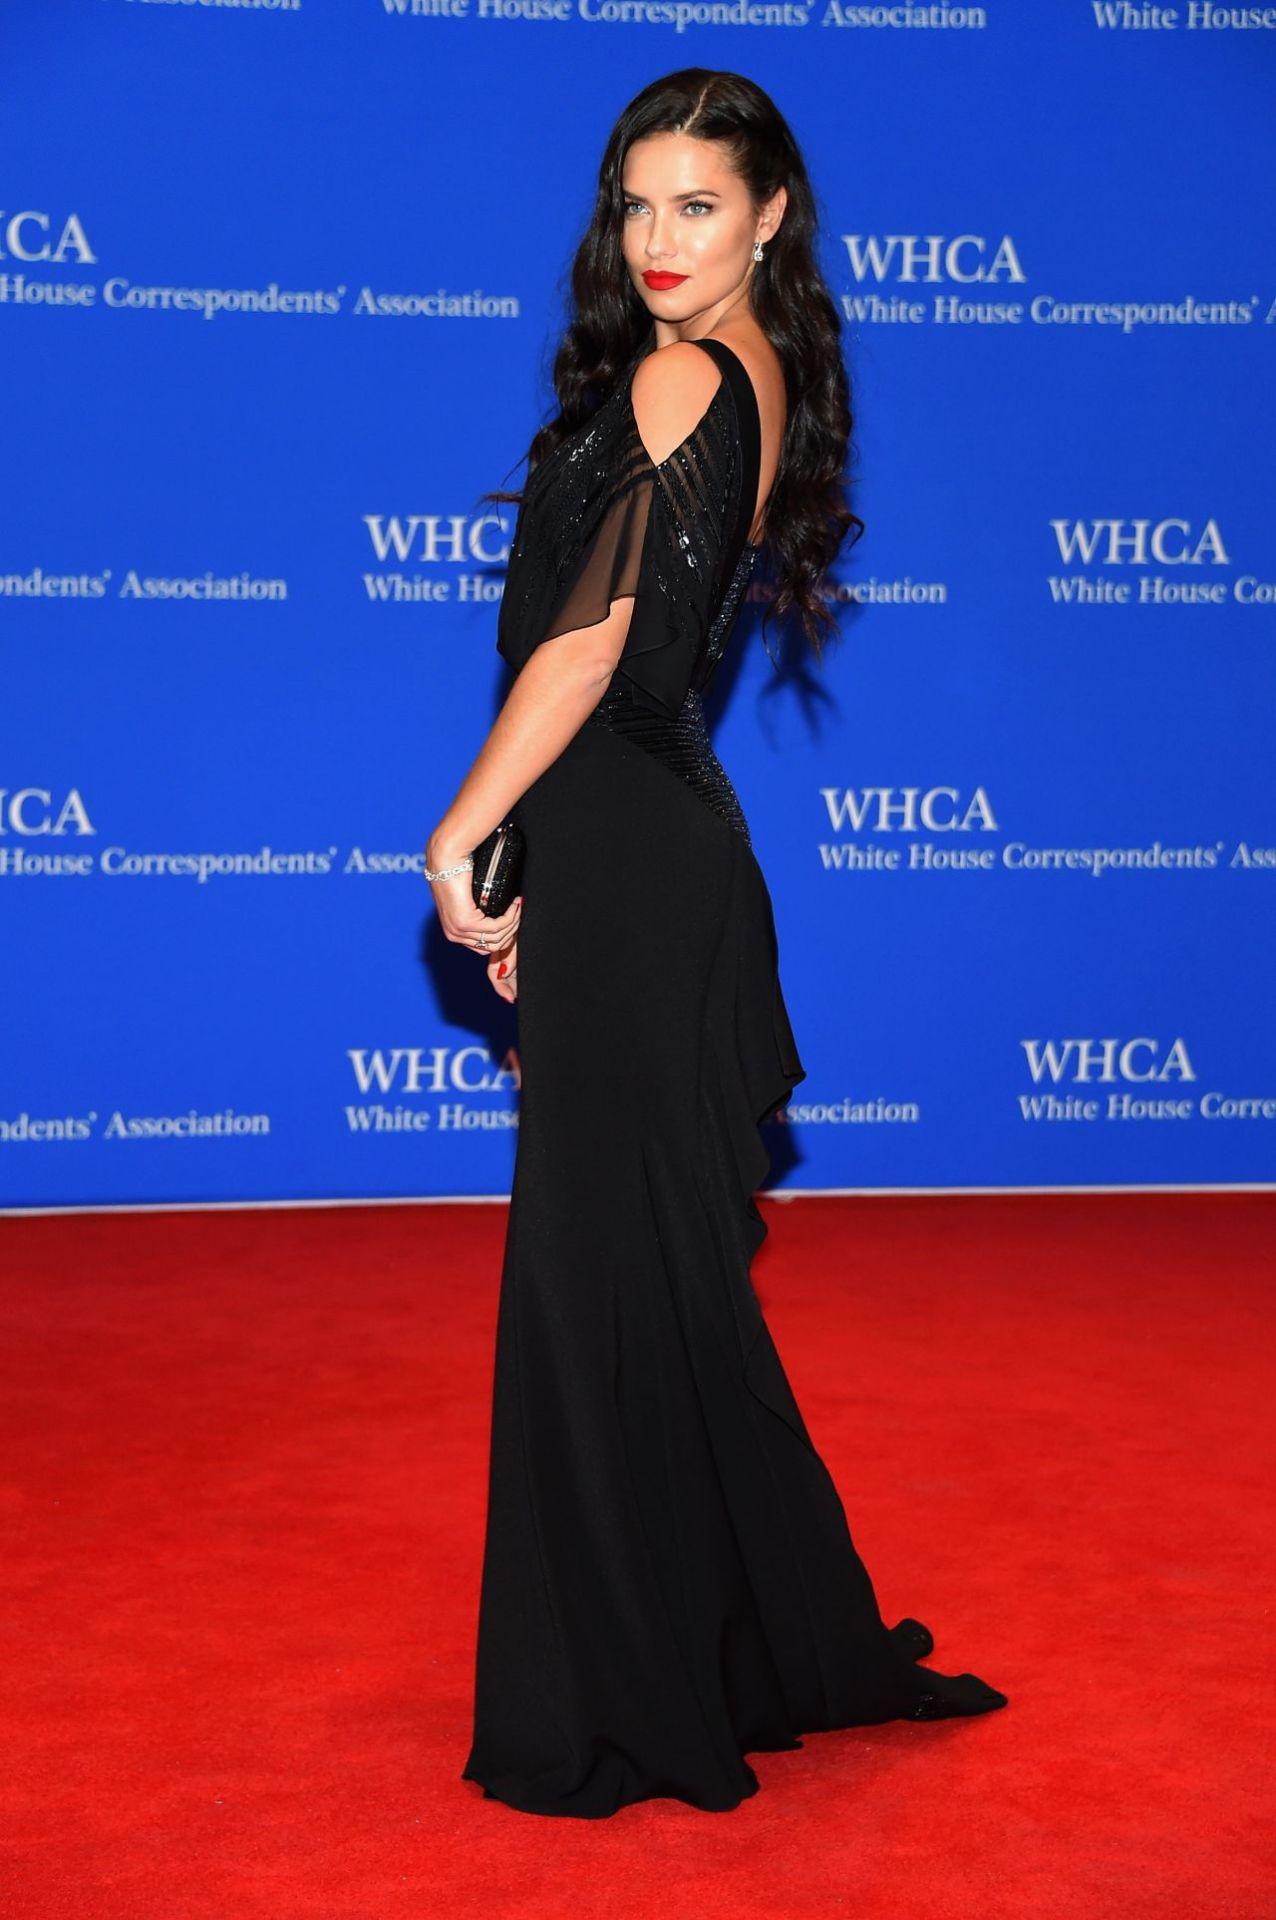 #Adriana Lima#supermodel#model#fashion